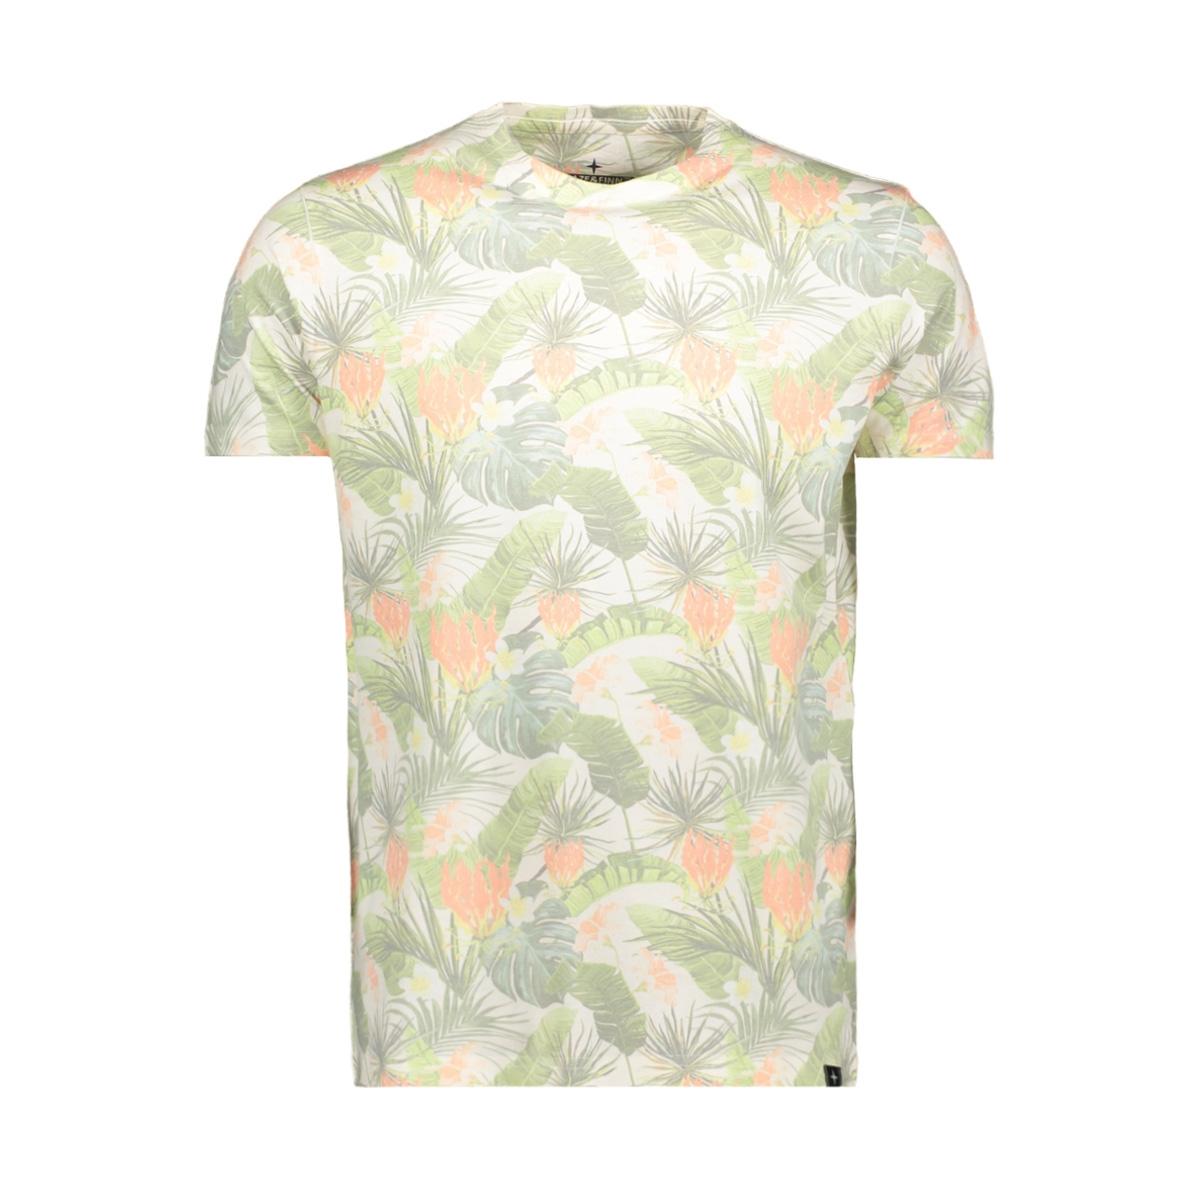 mu11 0002 tee sublimation print haze & finn t-shirt white jungle